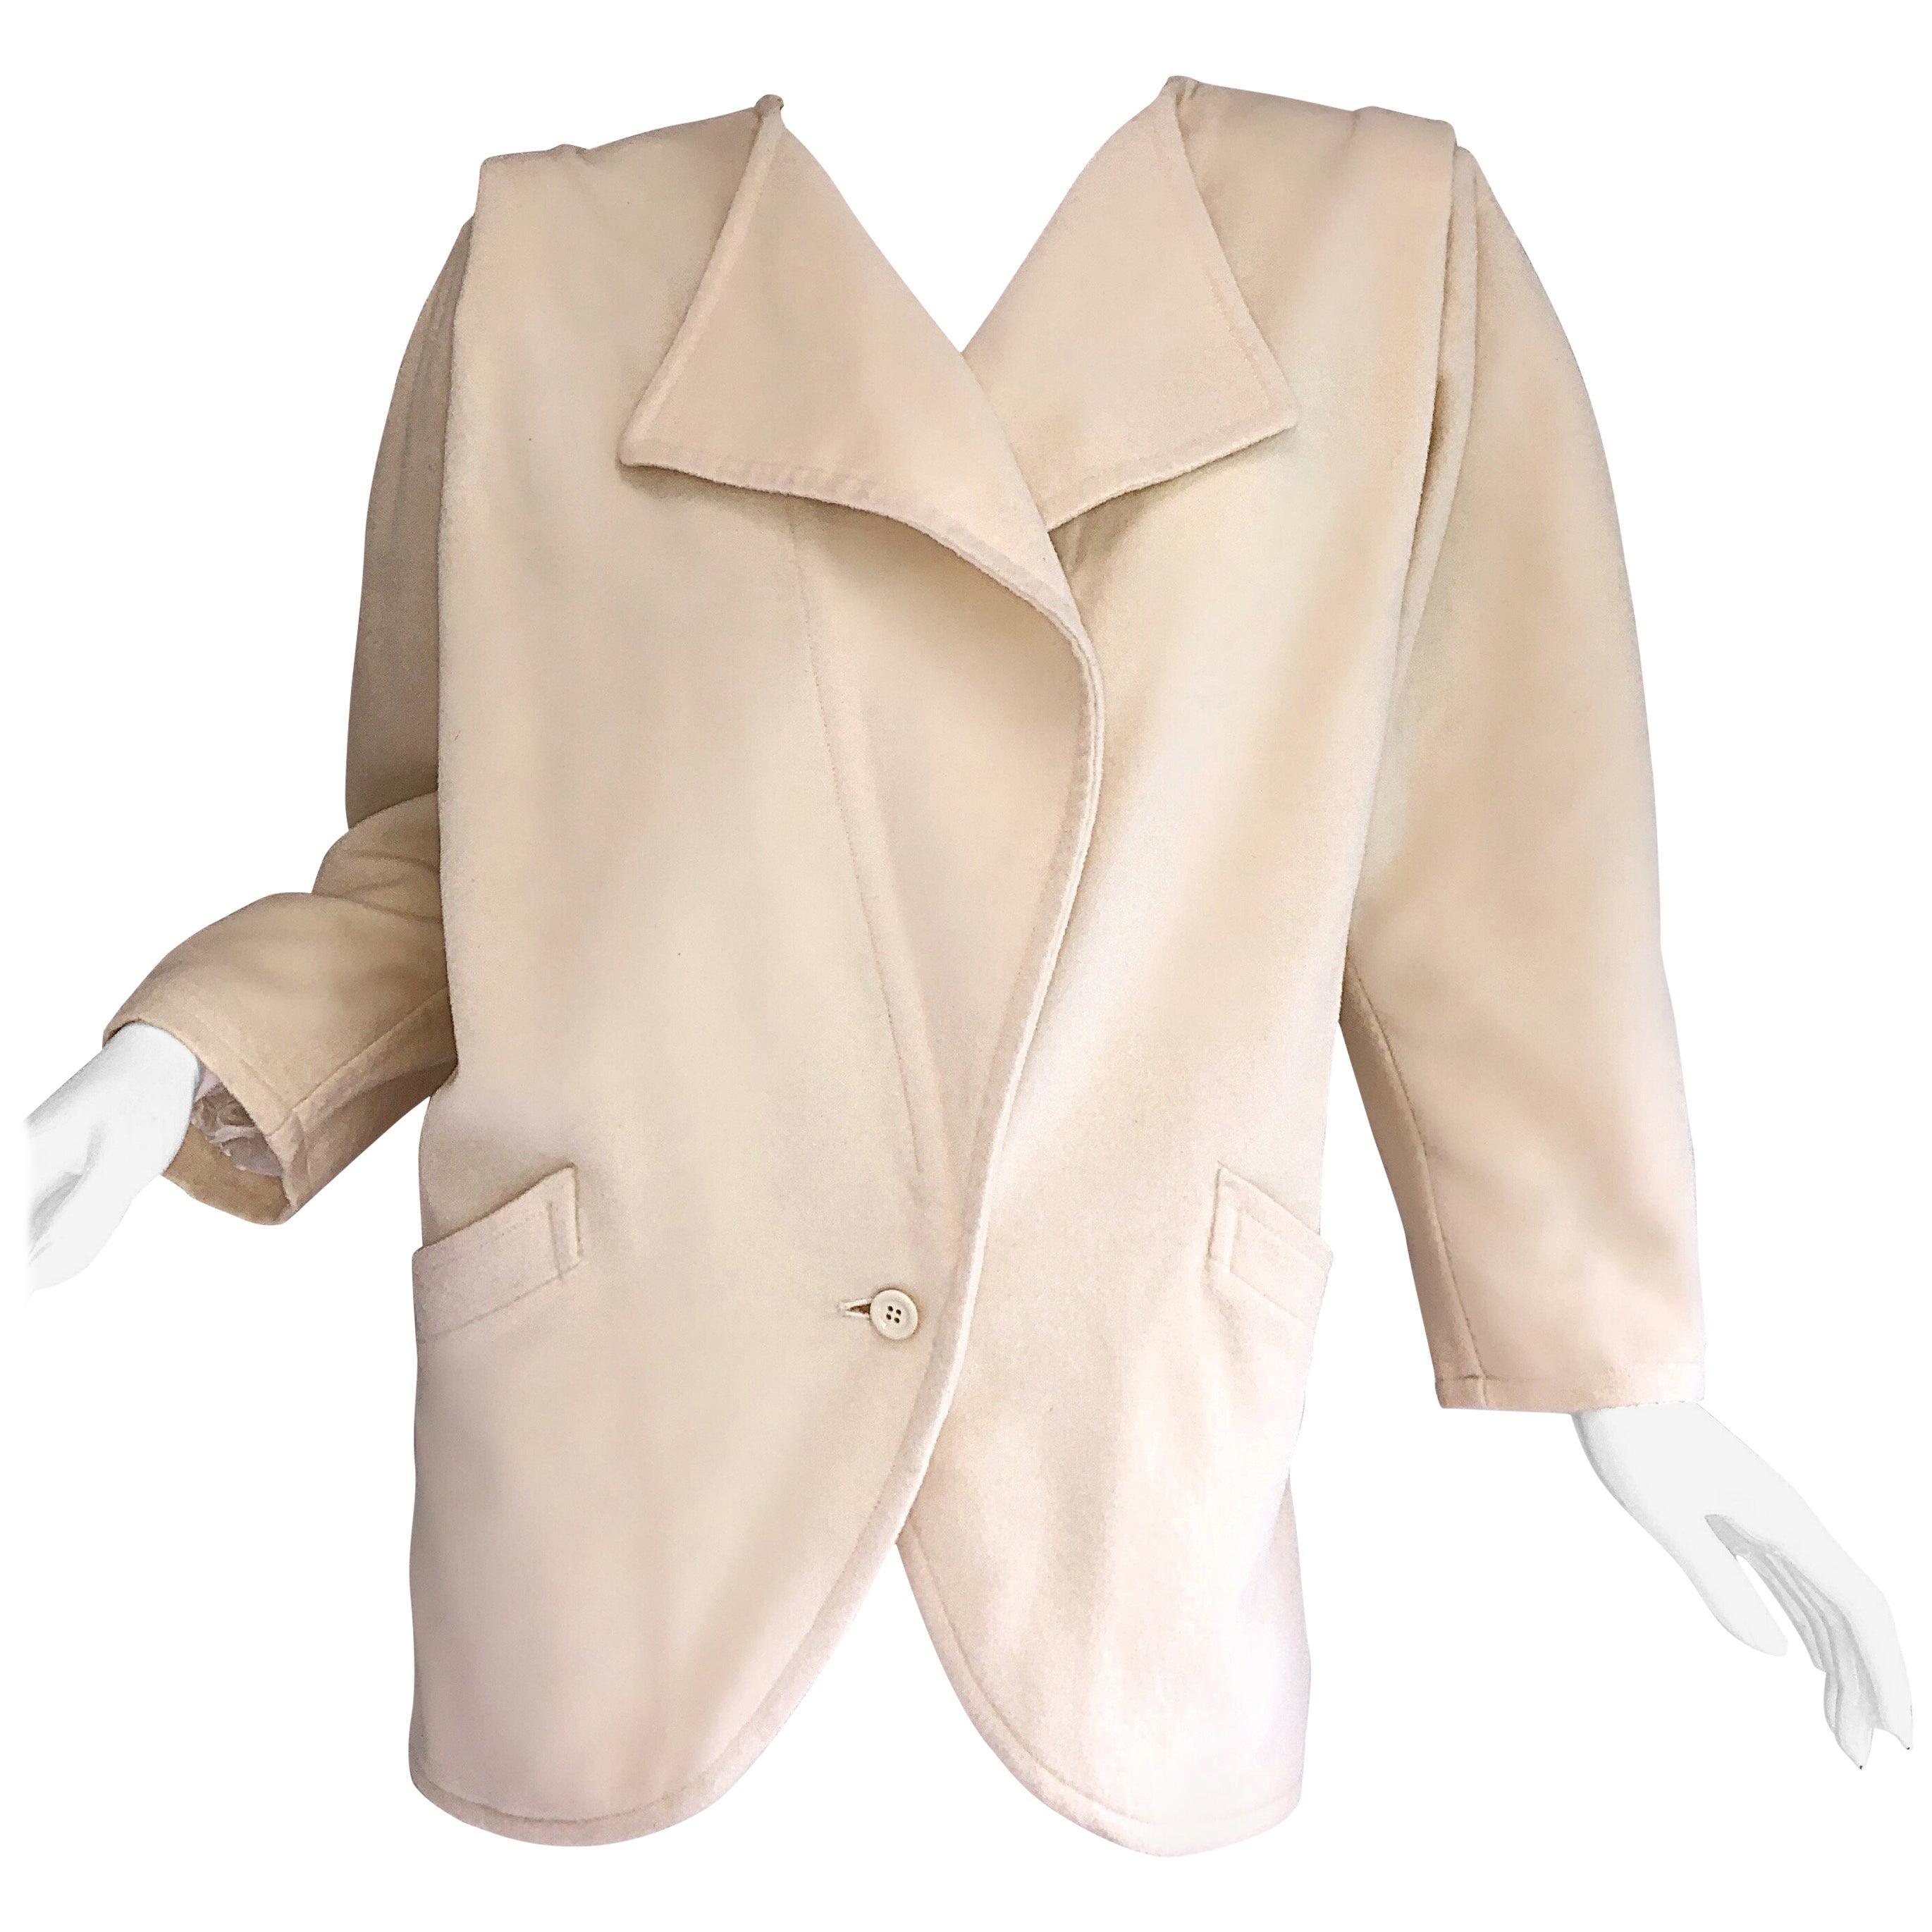 Fabulous Vintage Emanuel Ungaro 1980s Avant Garde Ivory Wool 80s Cocoon Jacket